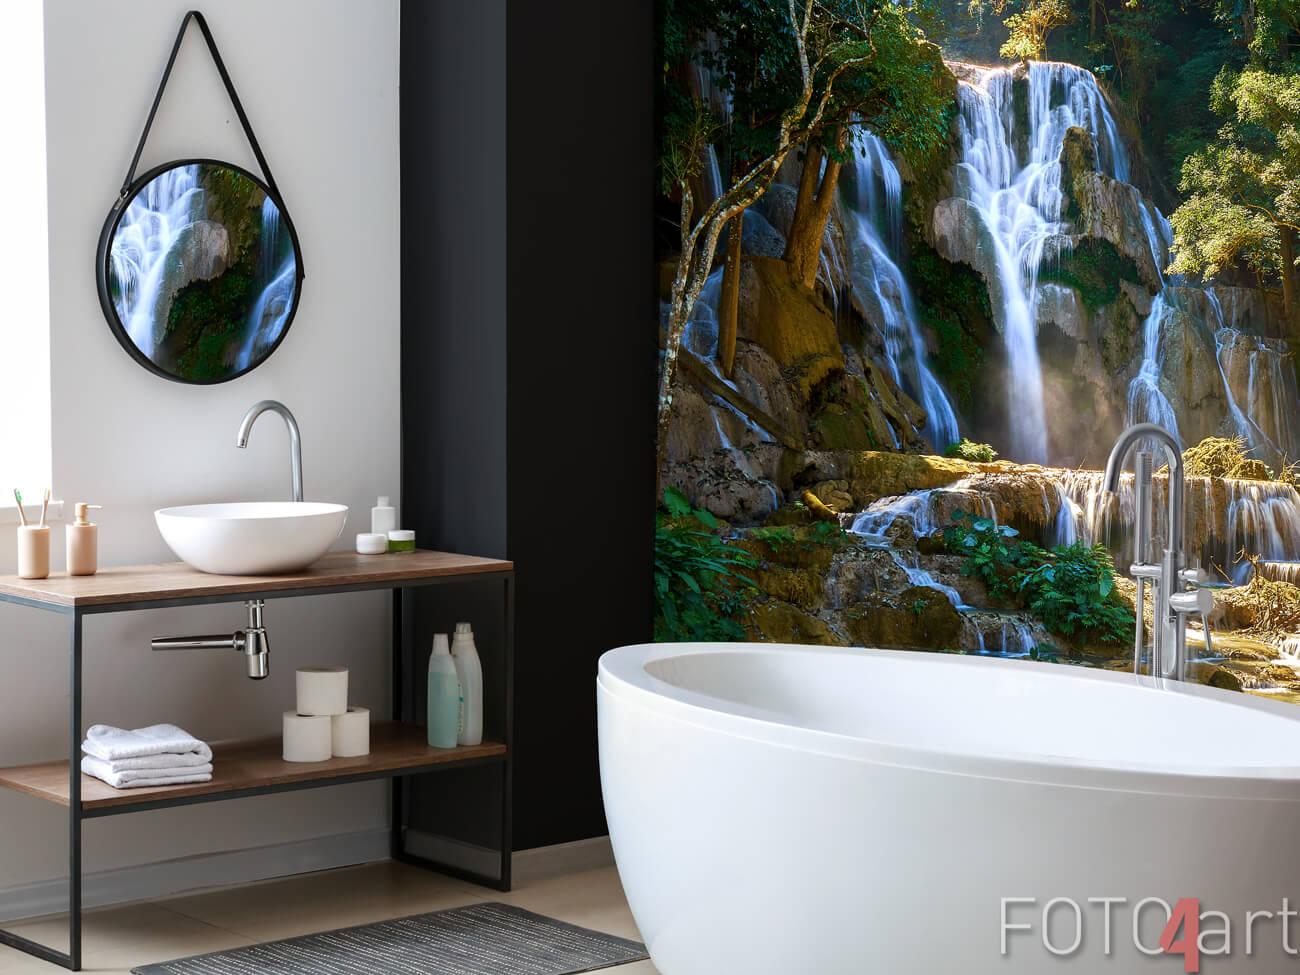 Glas Badezimmer Rückwand Wasserfall